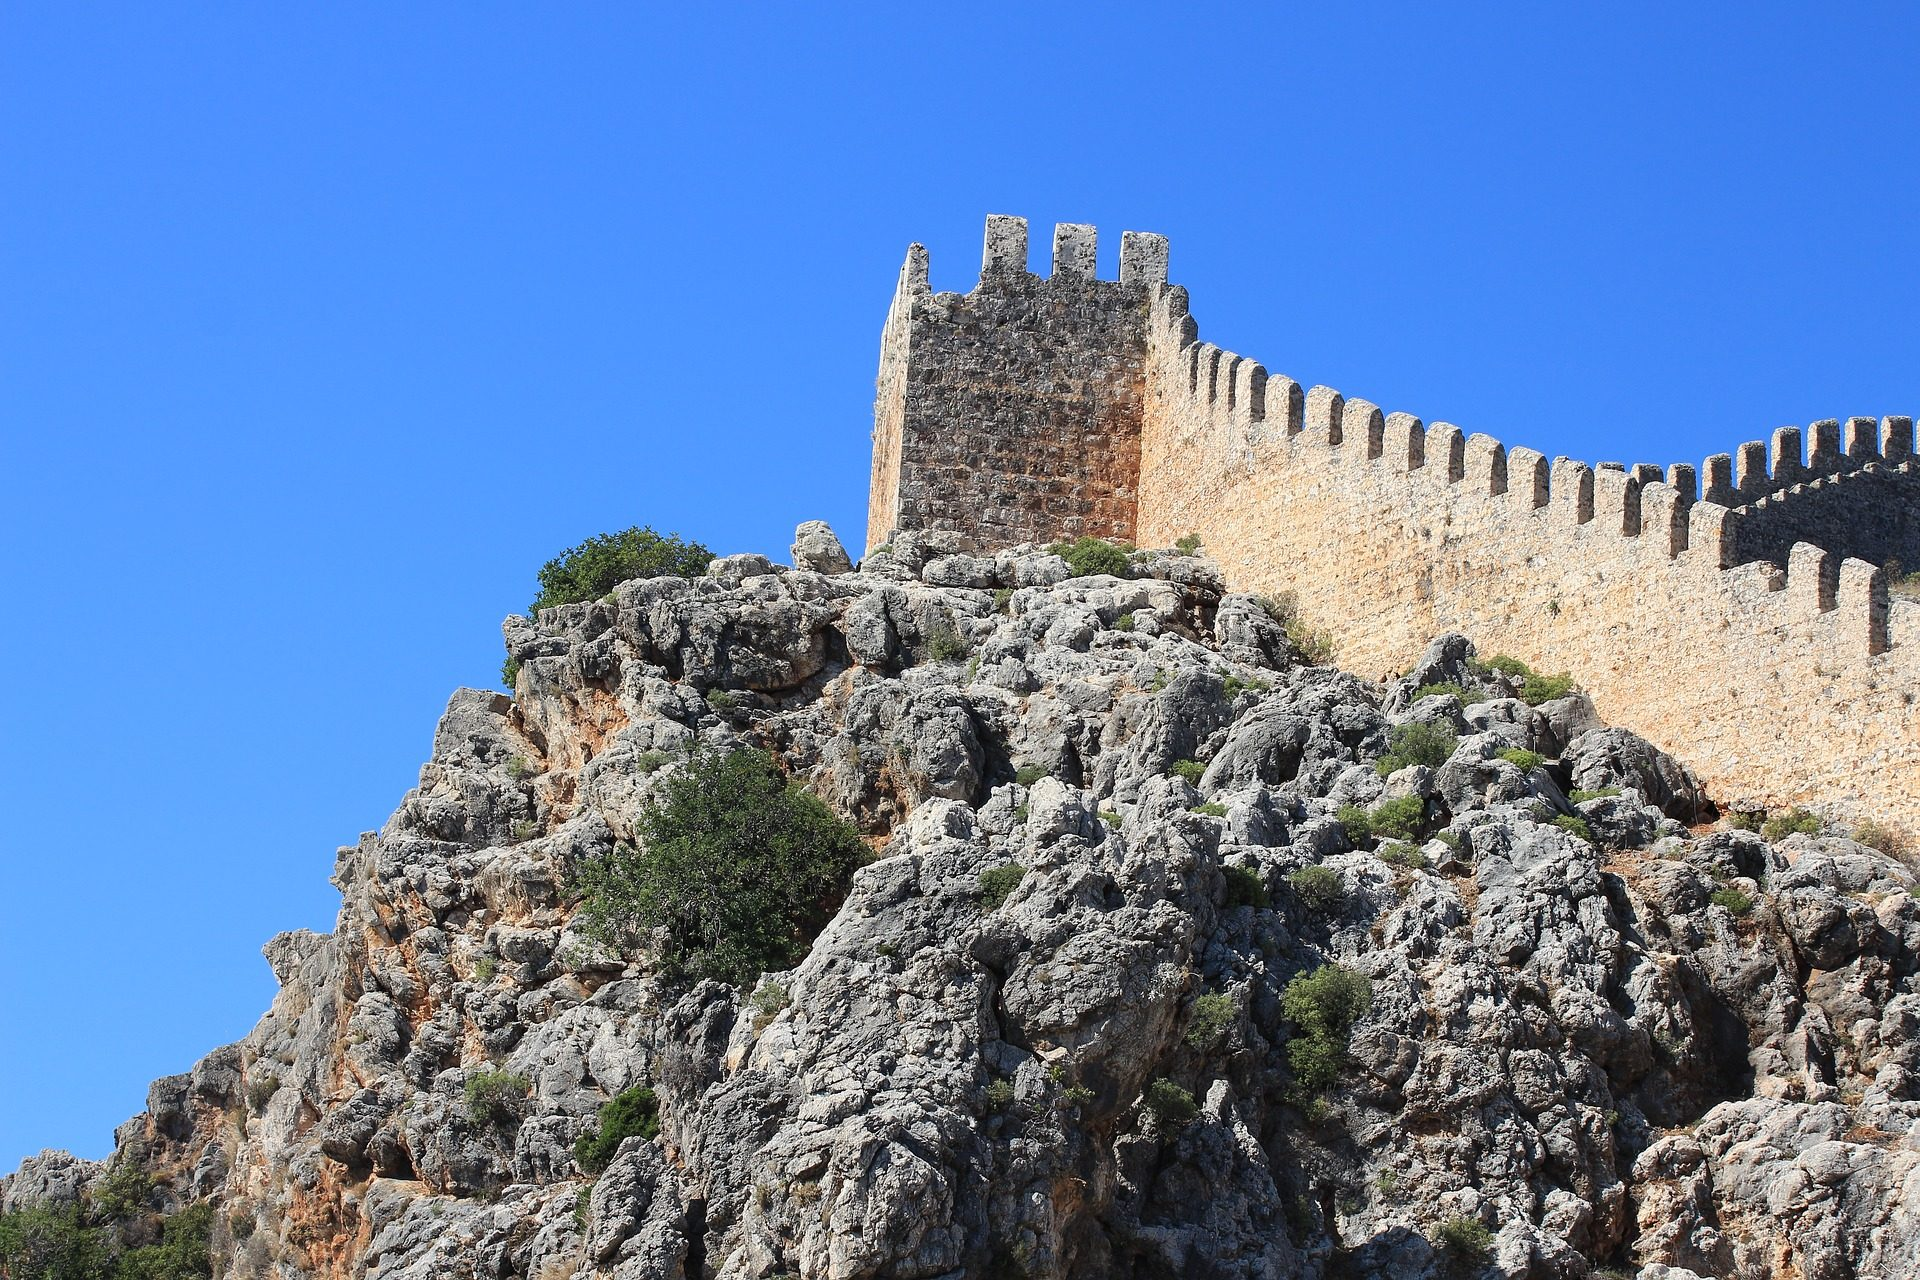 महल, पहाड़, खंडहर, टॉवर, दीवार - HD वॉलपेपर - प्रोफेसर-falken.com